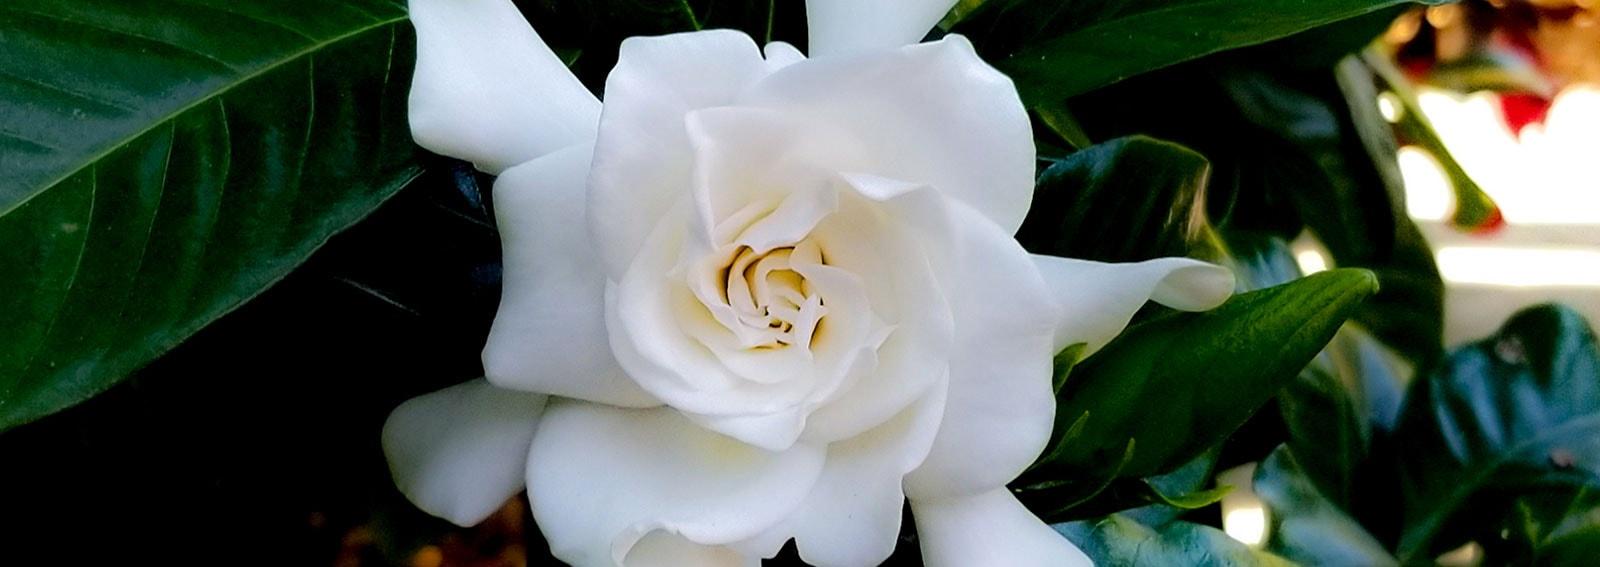 profumi-alla-gardenia-desktop